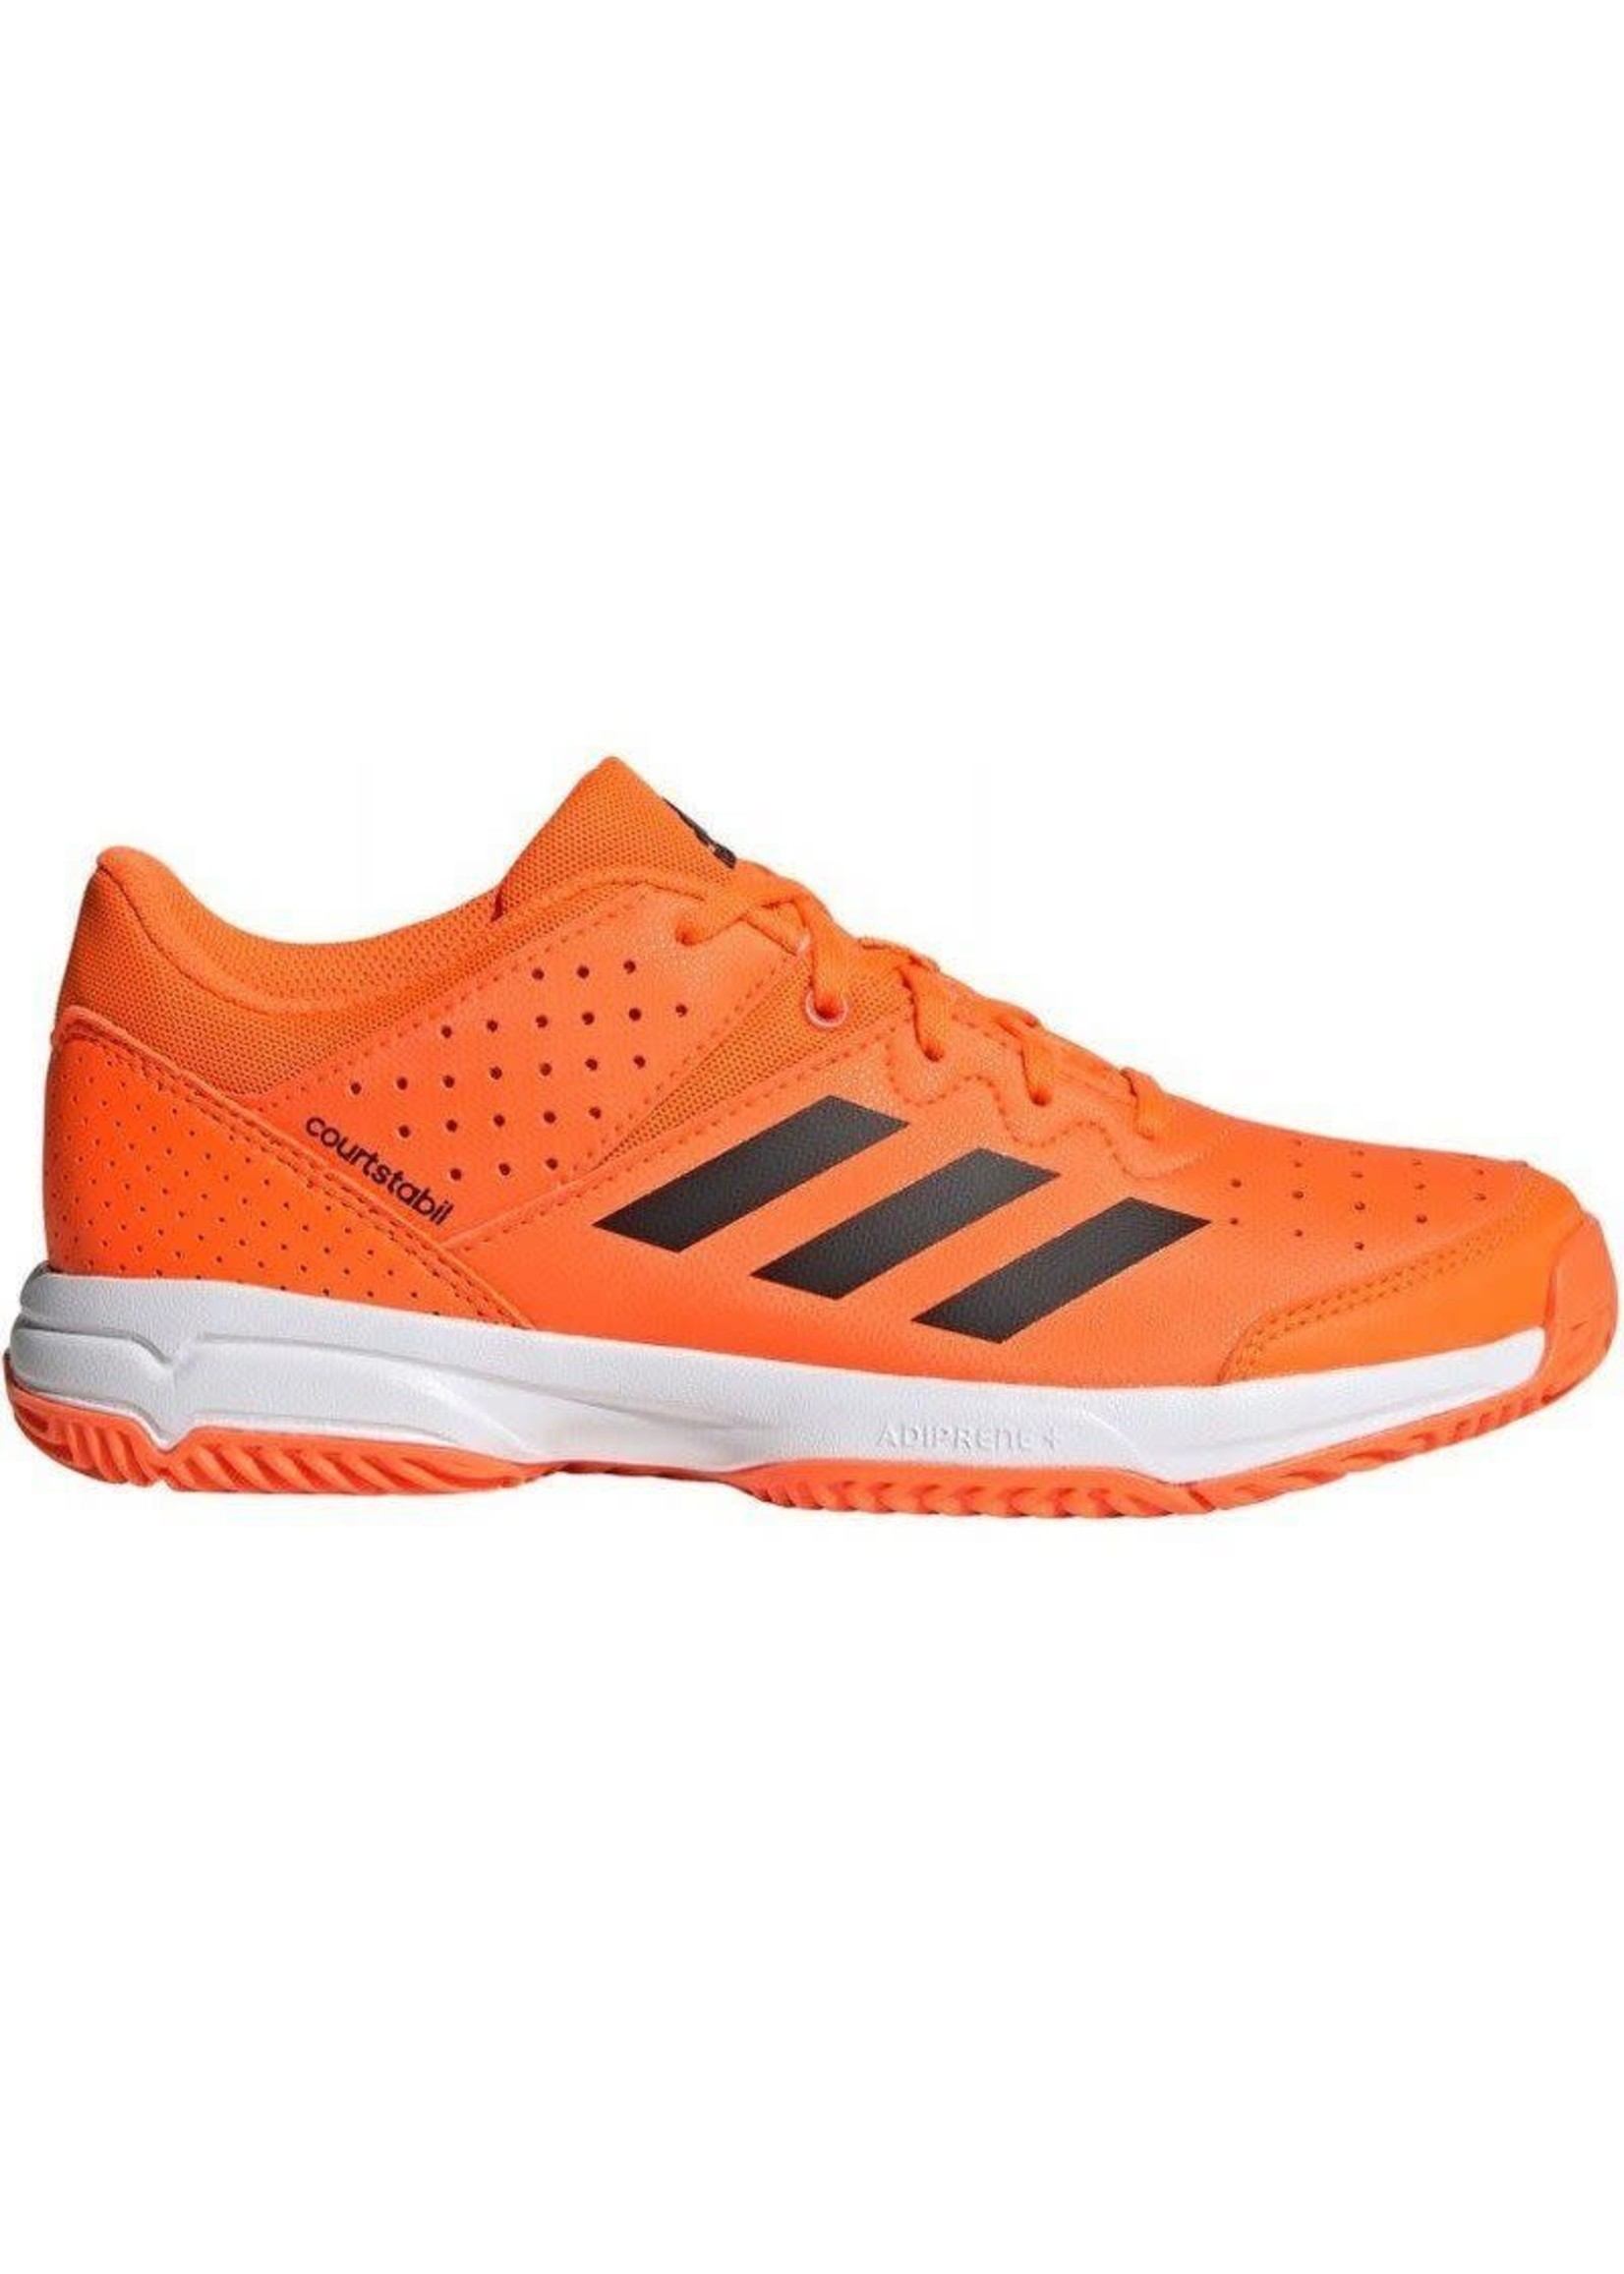 Adidas Adidas Court Stabil Jr Indoor Shoe (2019) - Orange